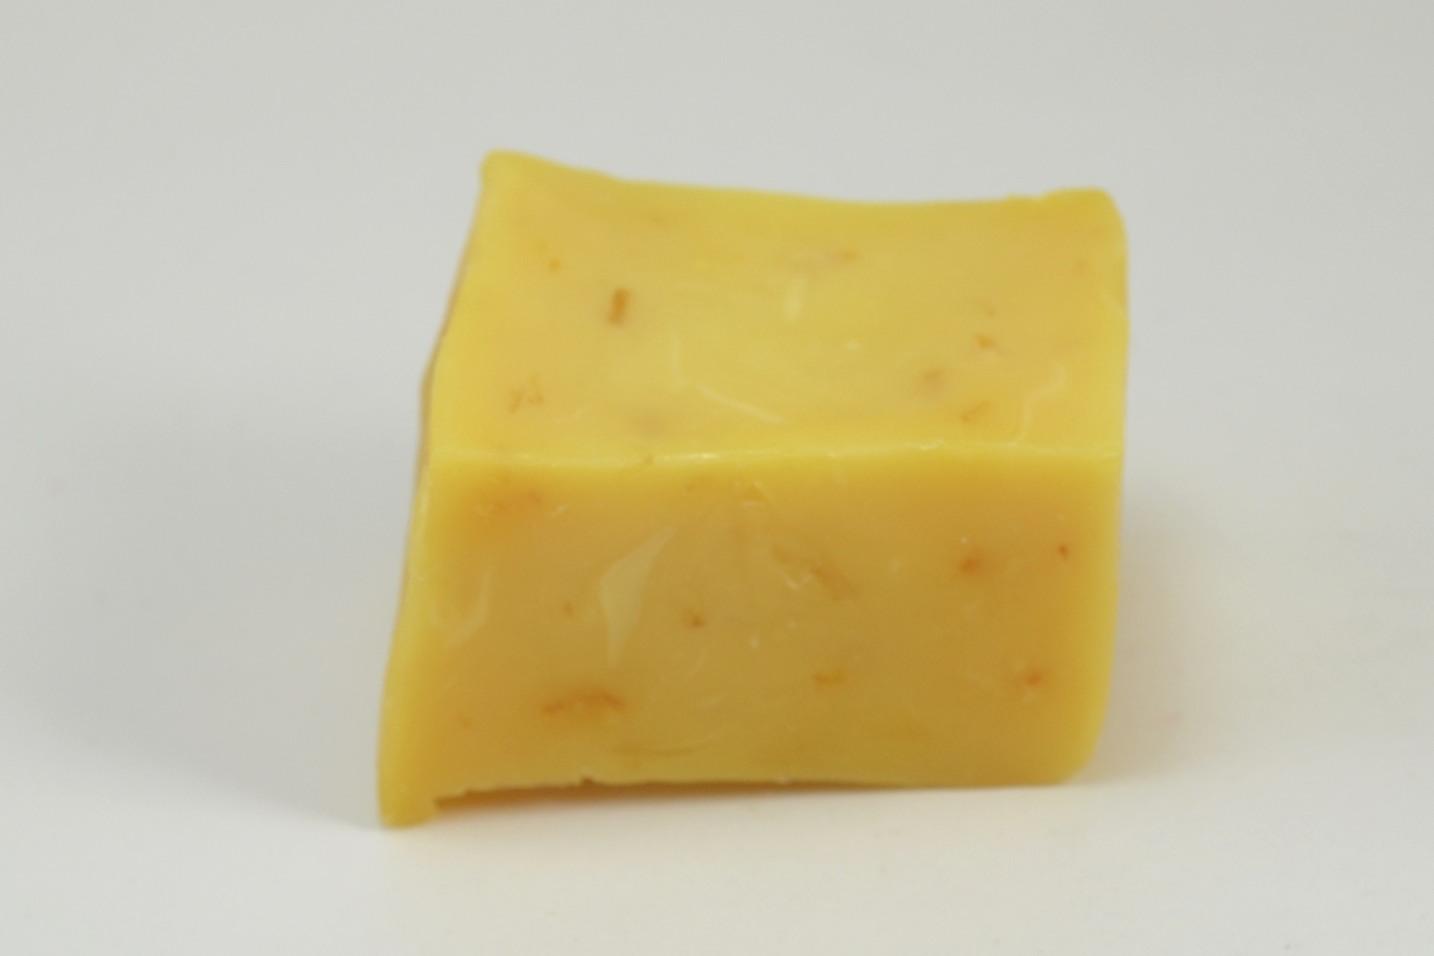 lush sexy peel soap review